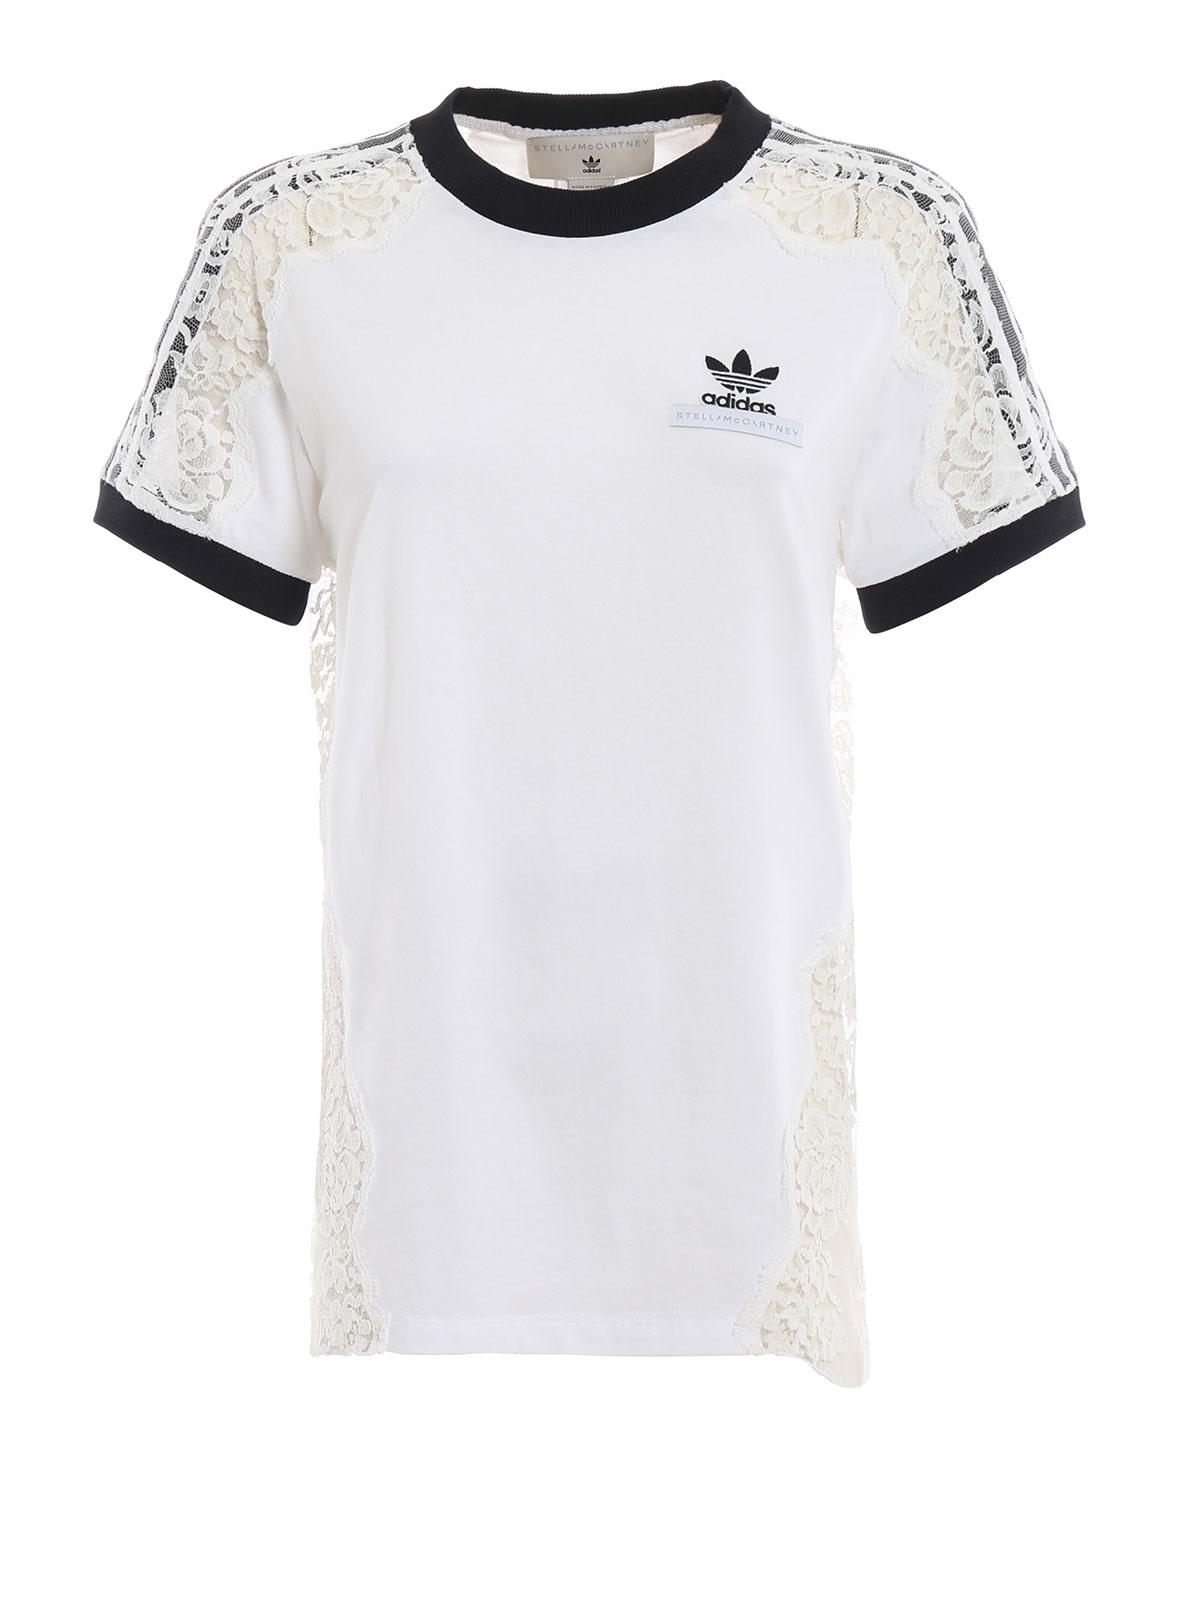 d31142c0cd Adidas by Stella McCartney - See-through lace detail white T-shirt ...